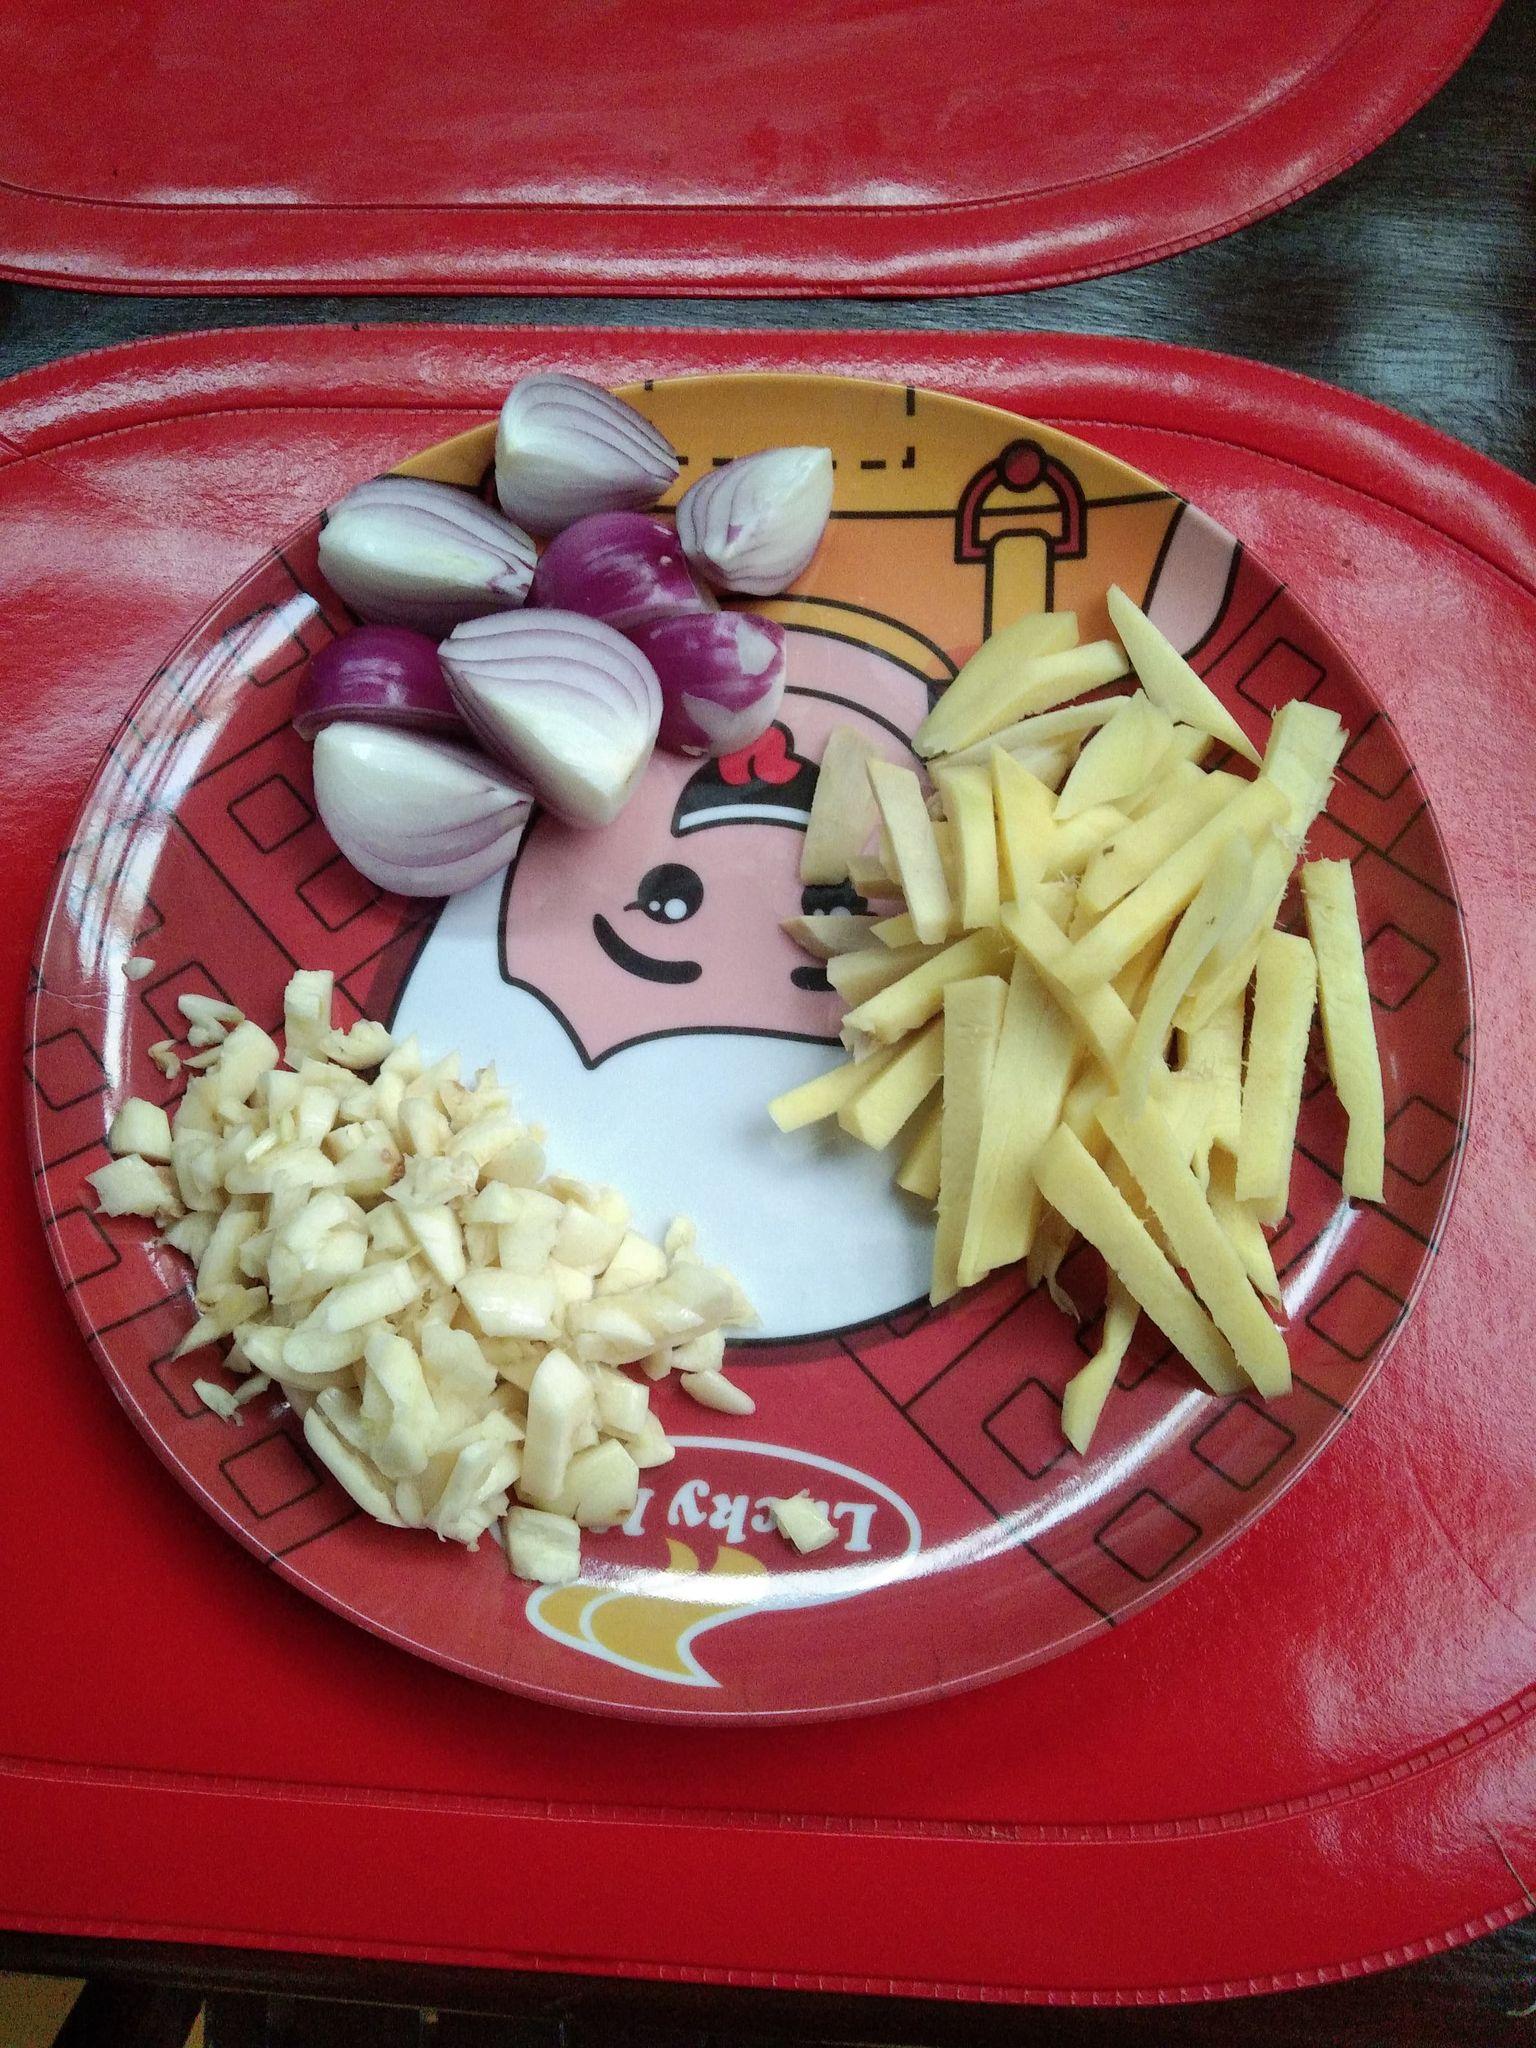 Slices of garlic, onions, and garlic.